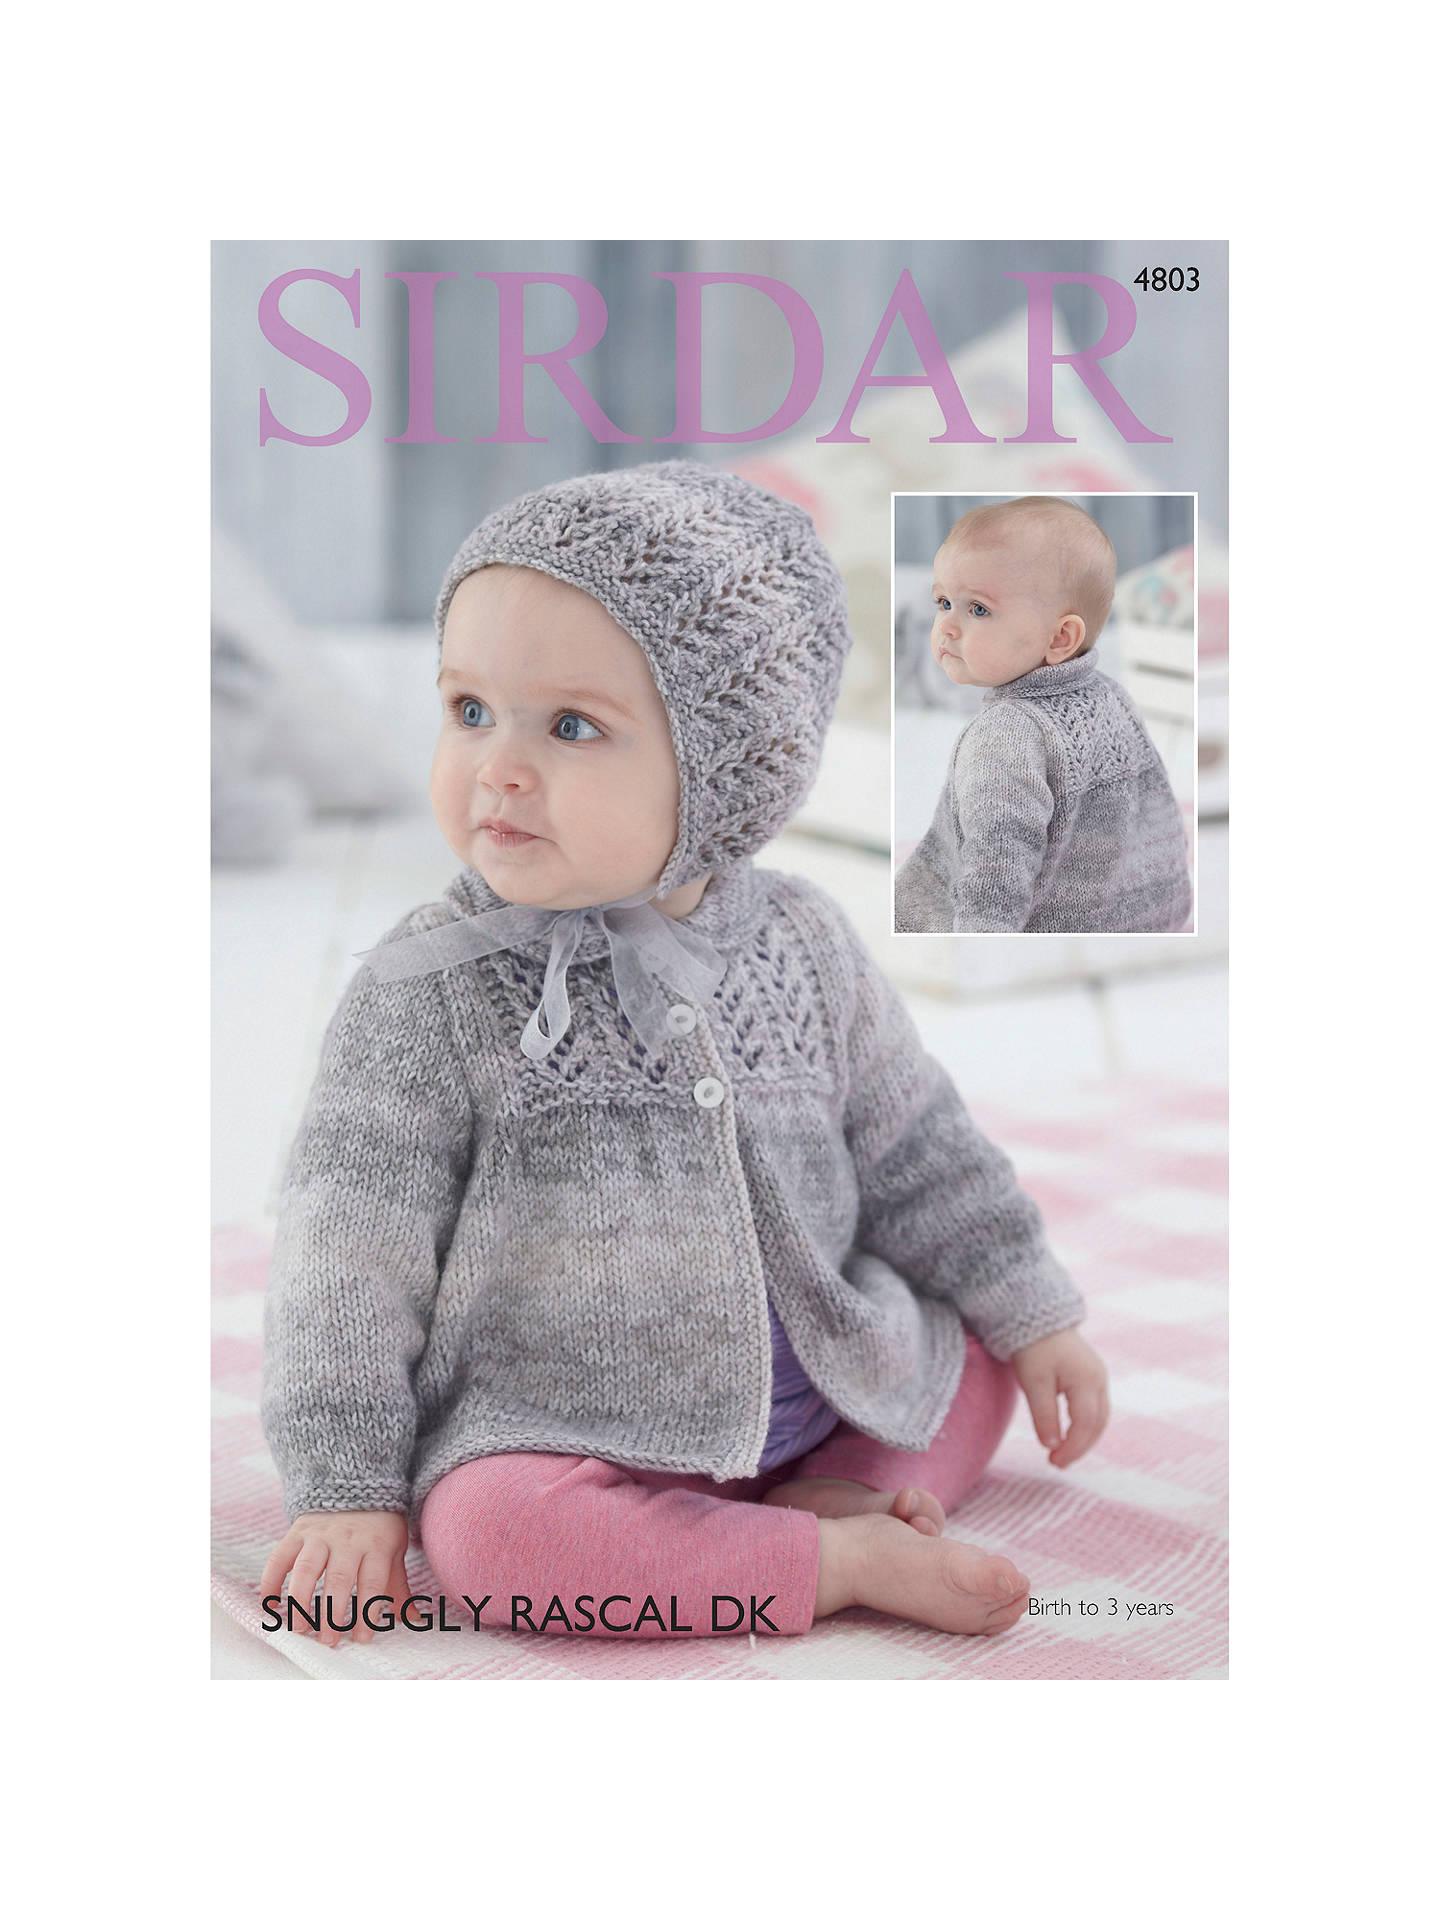 Sirdar Snuggly Baby Rascal DK Knitting Pattern Book, 4803 ...